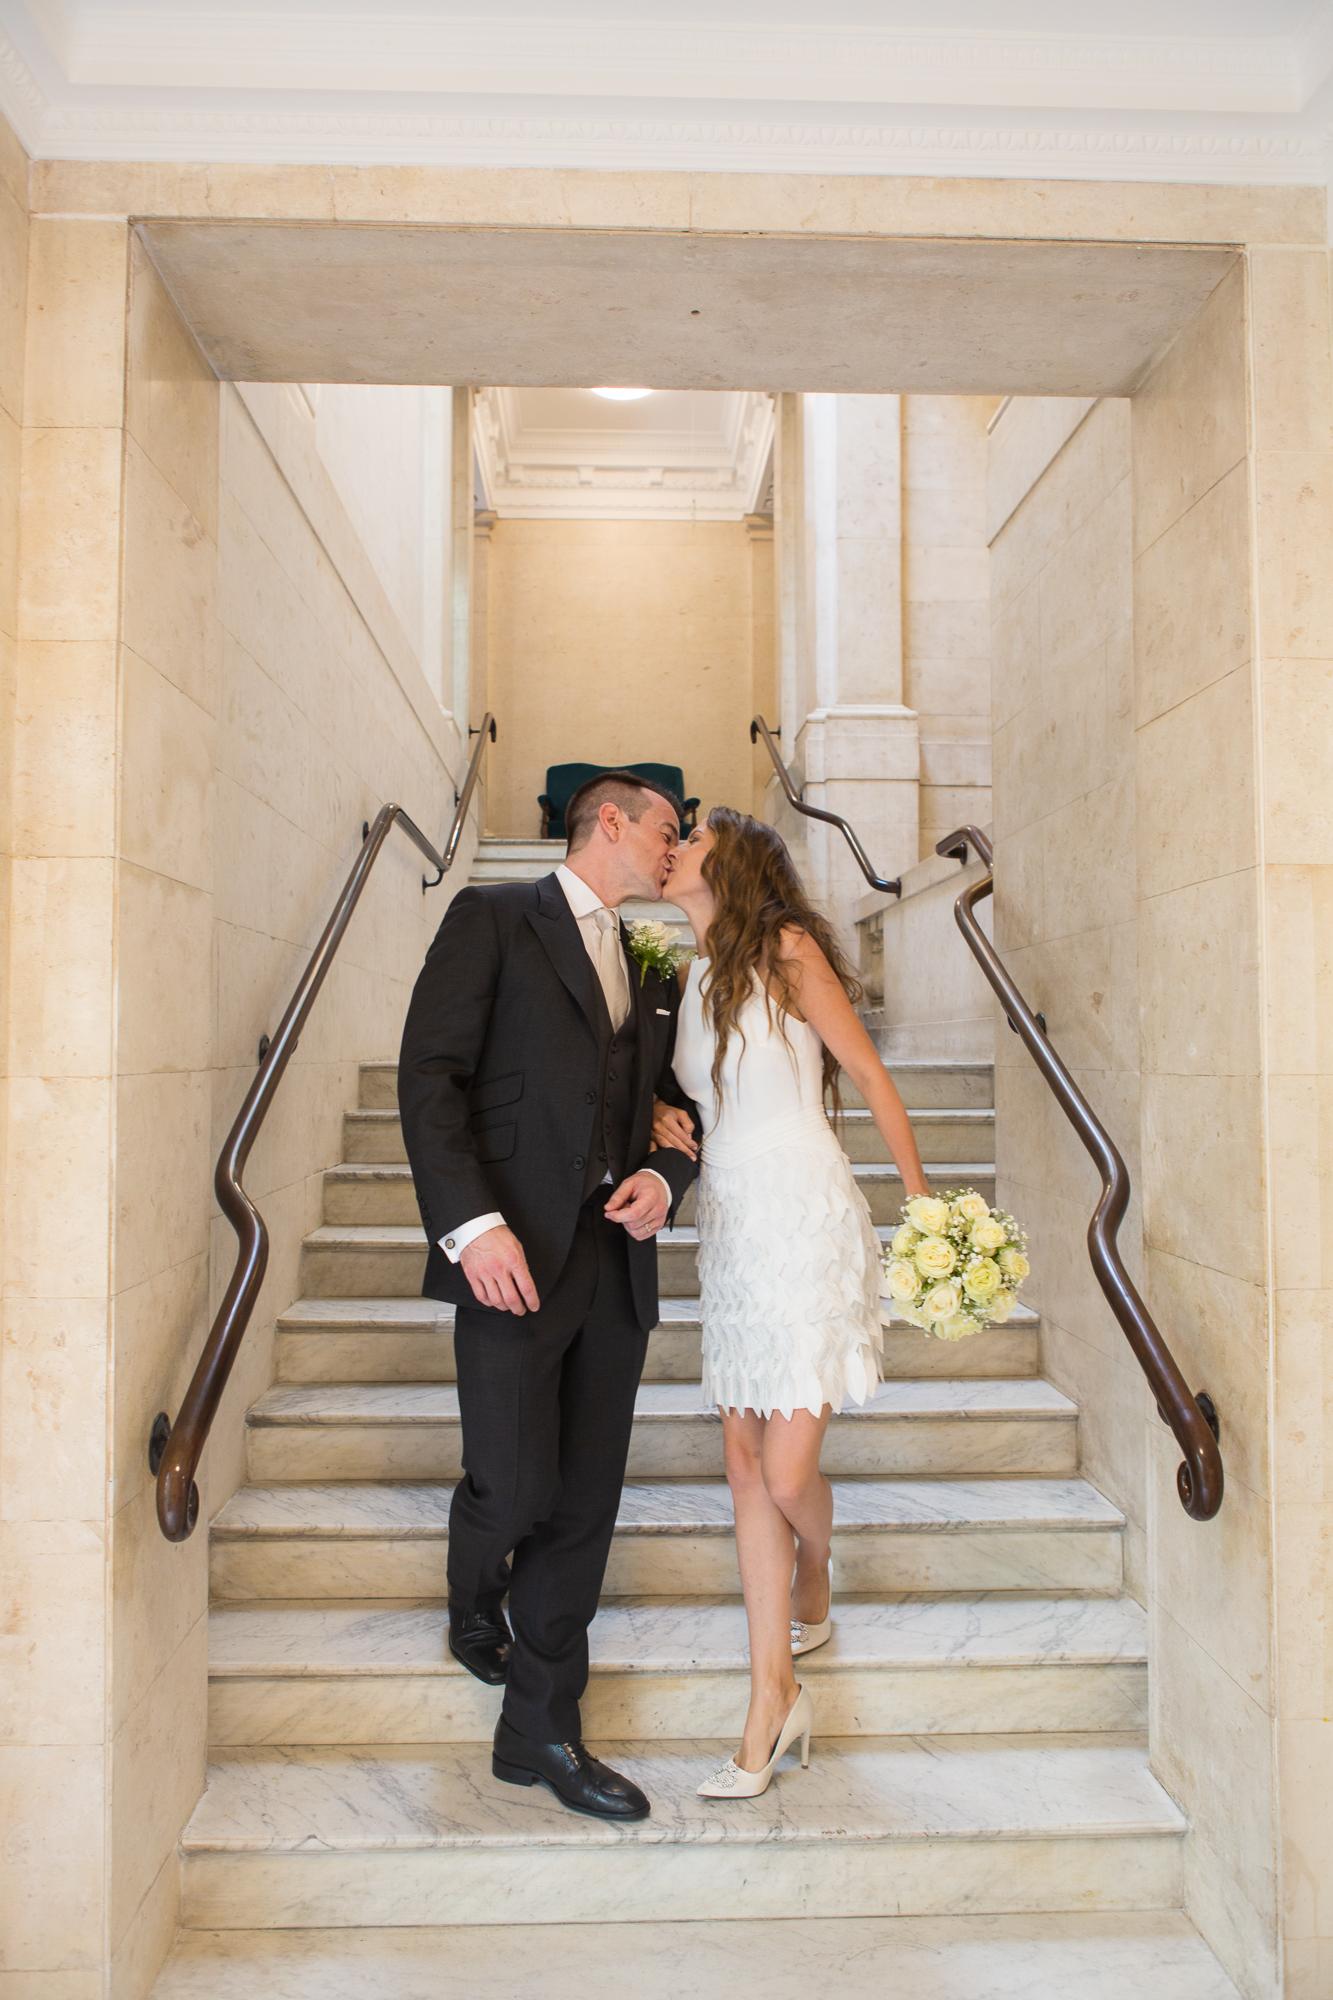 Just_Married_Marylebone_Registry_Office_London_Wedding_Group_Natural_Fun_Rachel_Thornhill_Photograph